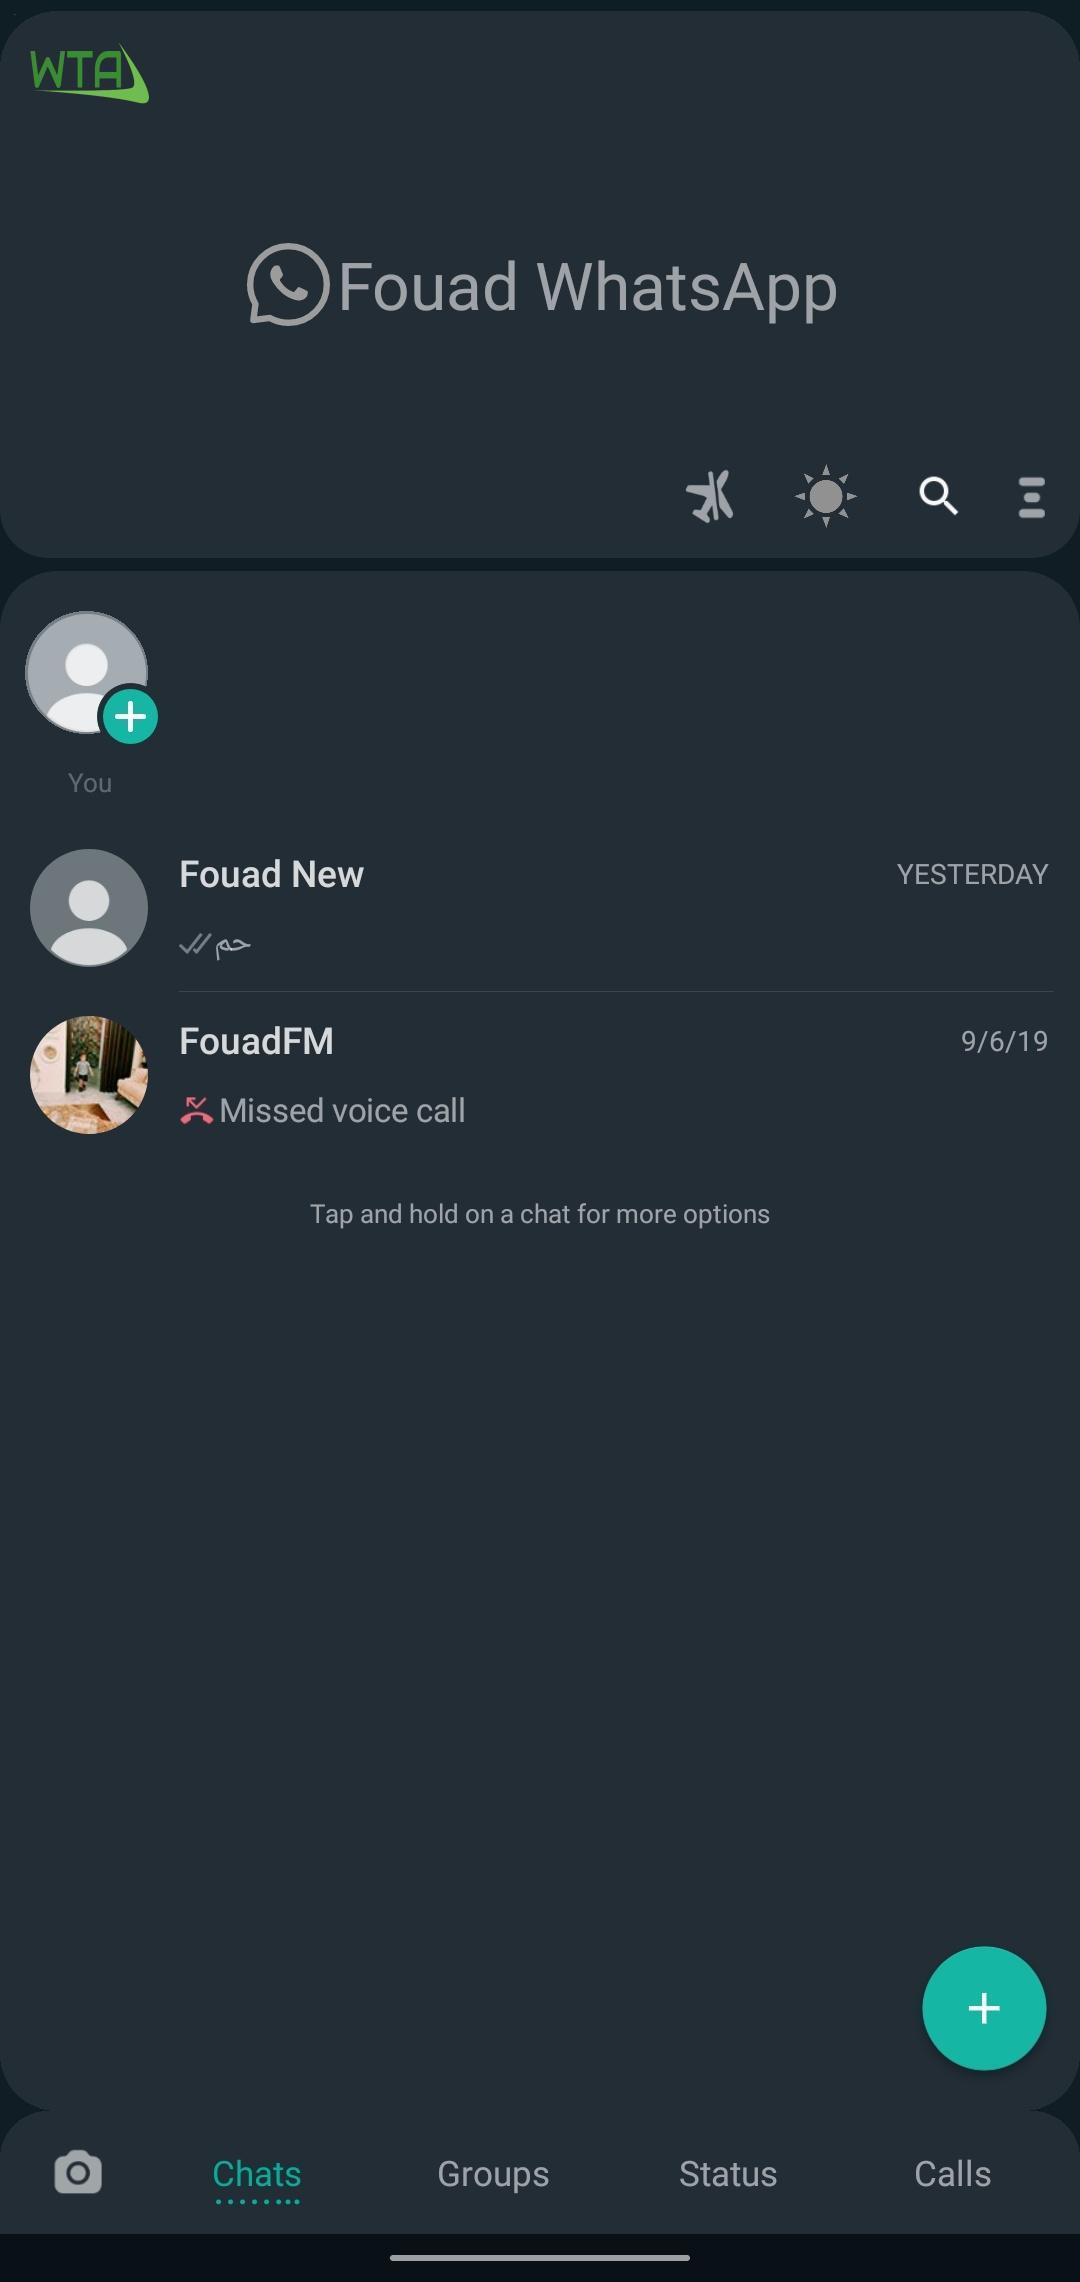 fm whatsapp 8.95 download